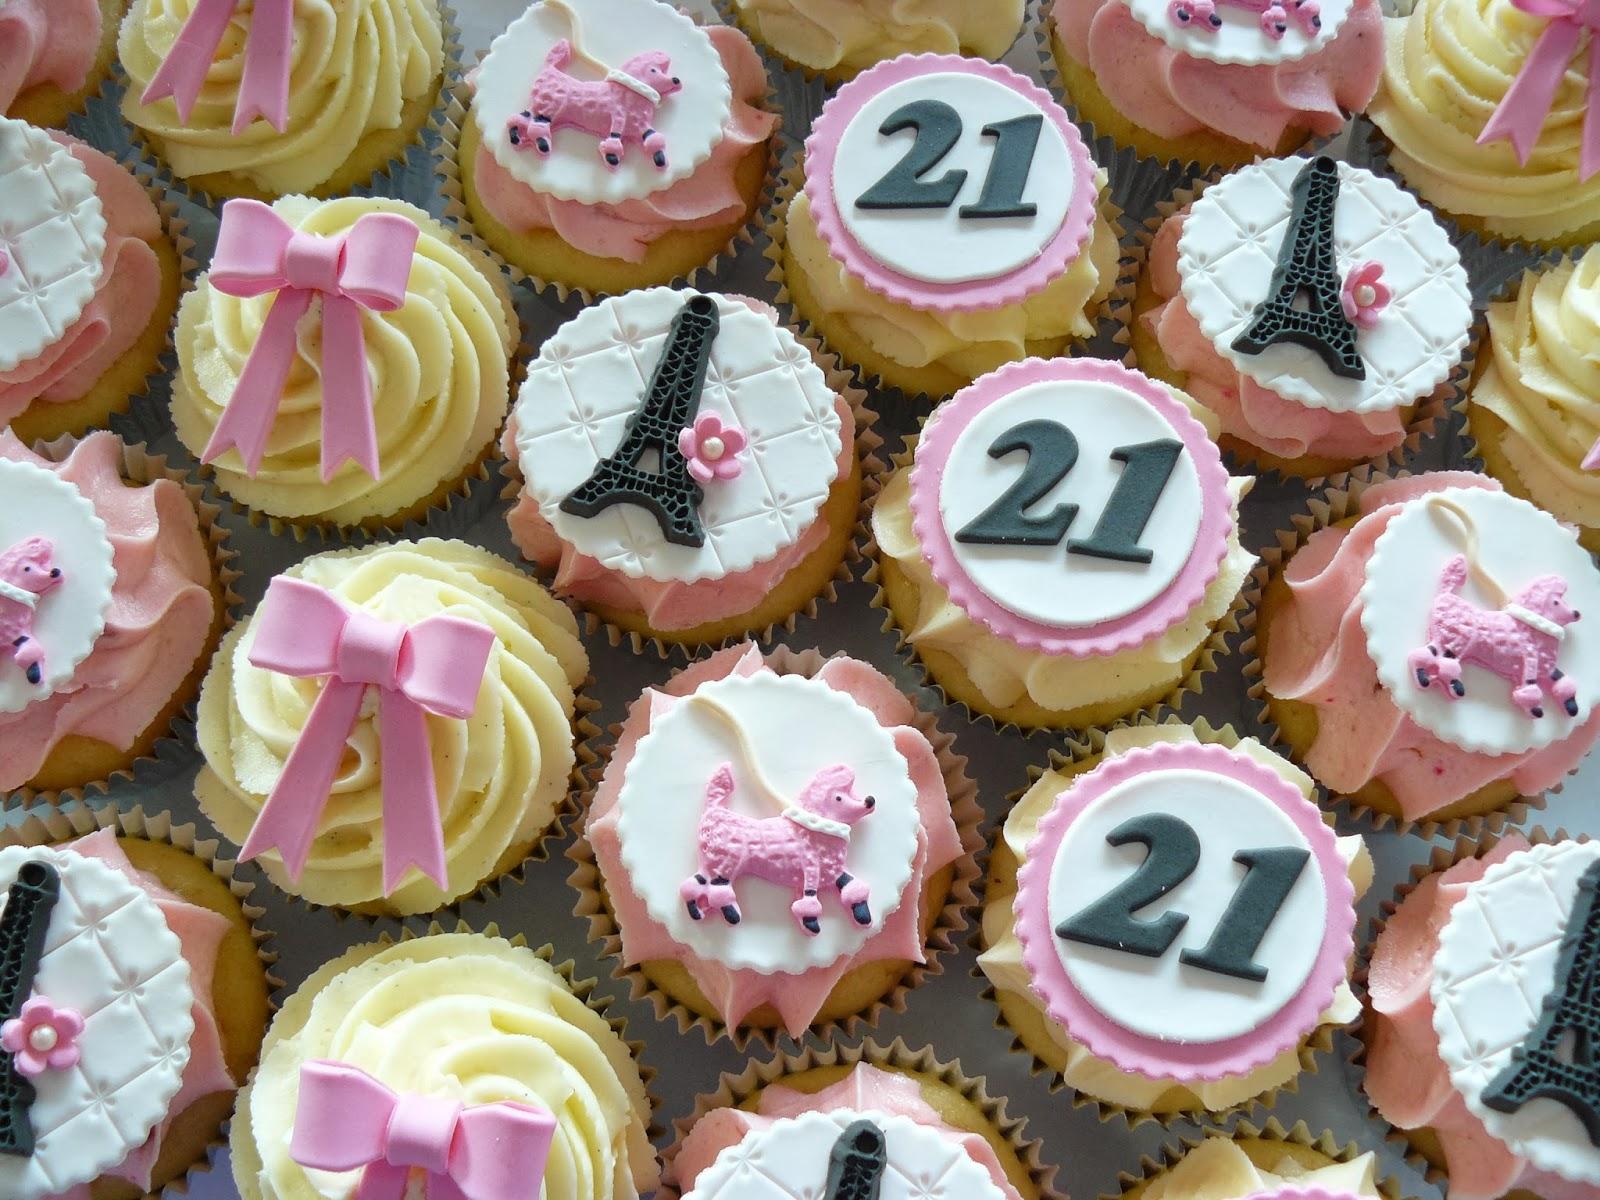 Eiffel Tower Cupcakes